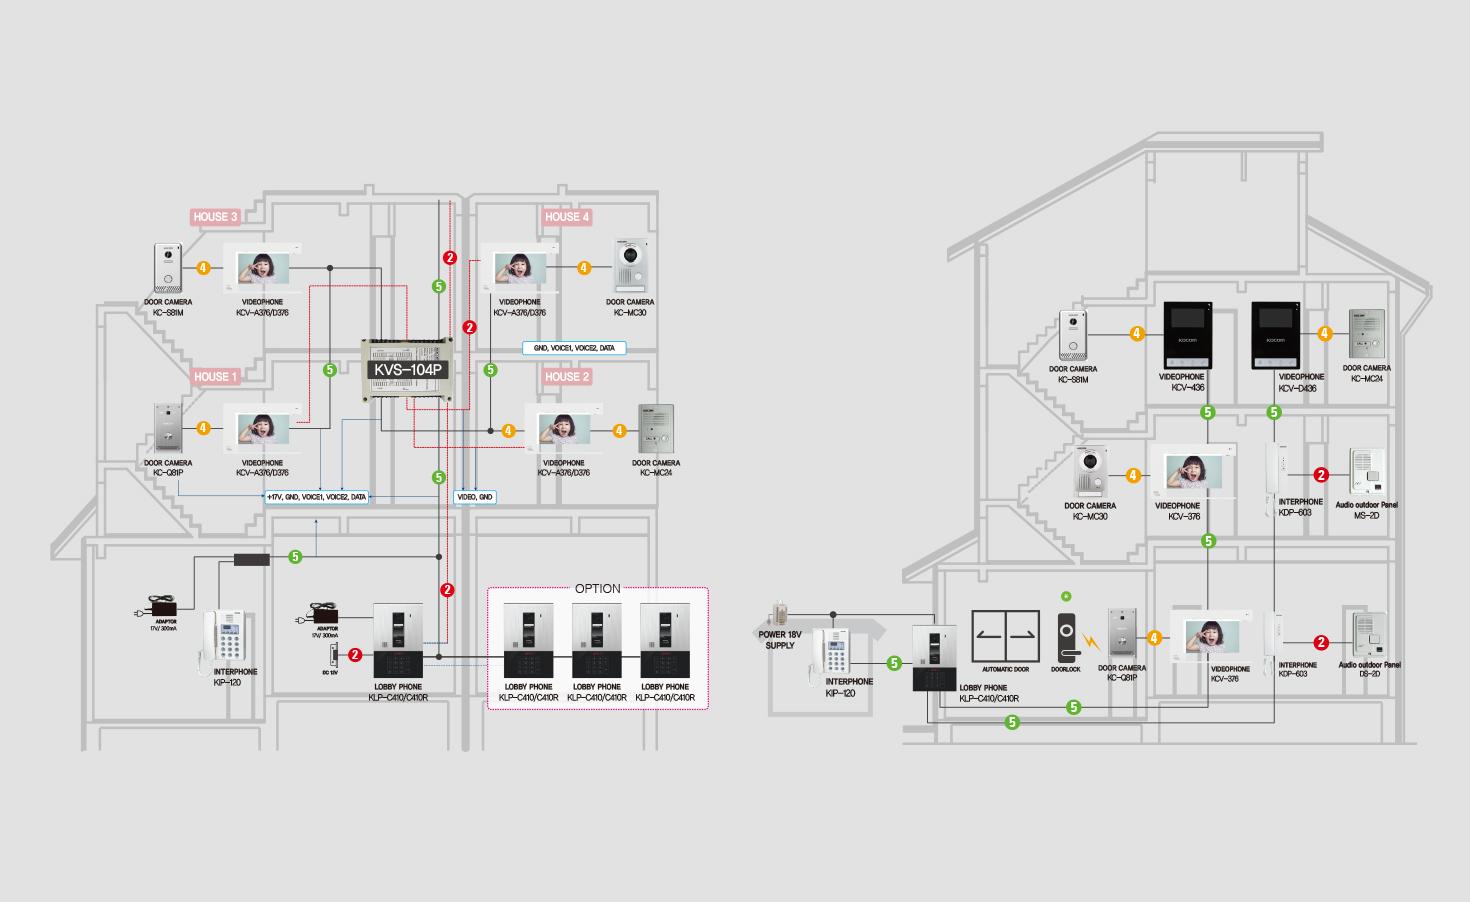 سیم کشی گار کوکوم System Diagram klp- 120